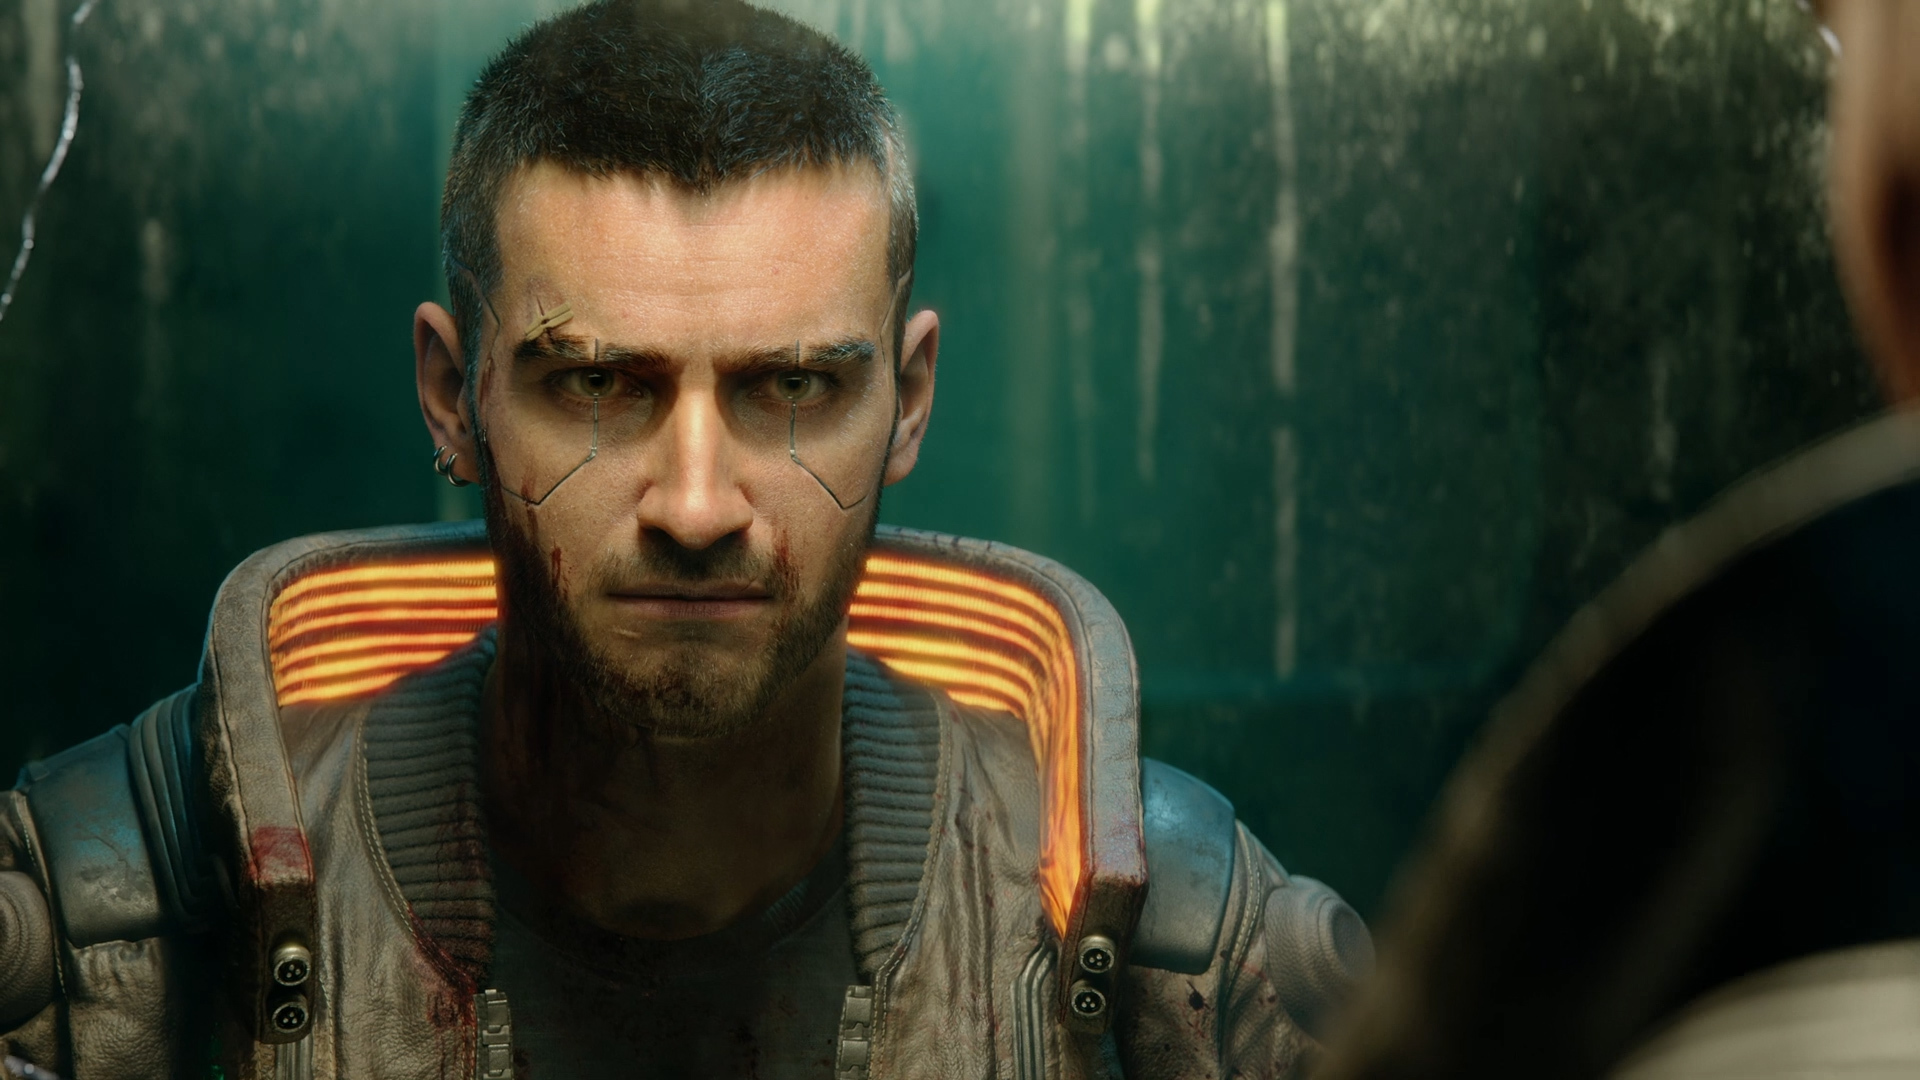 CD Projekt, i dati rubati ai game designer sono già stati venduti